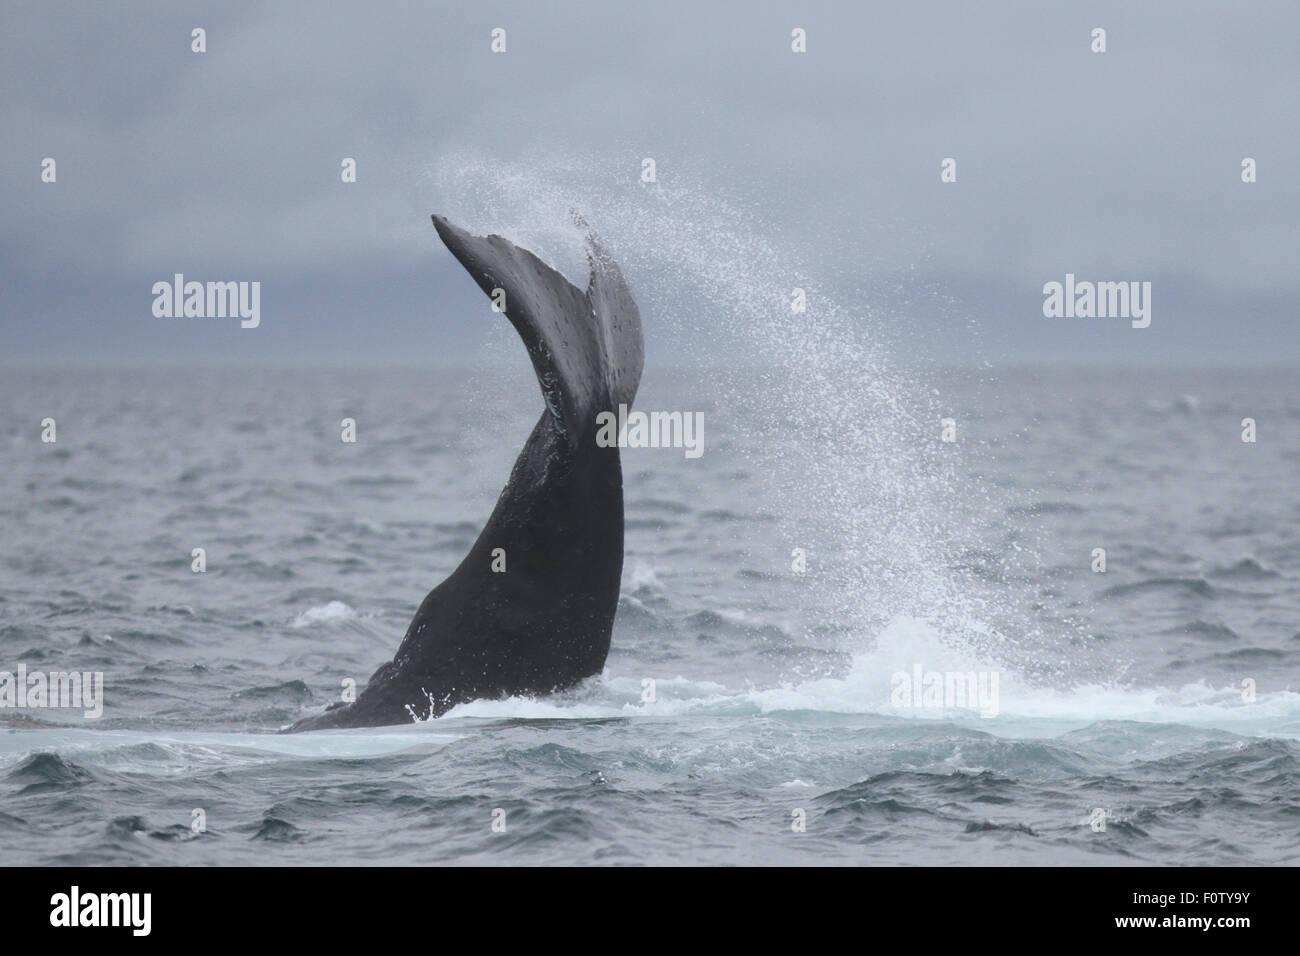 Humpback Whale lobtailing off South East Alaska - Stock Image